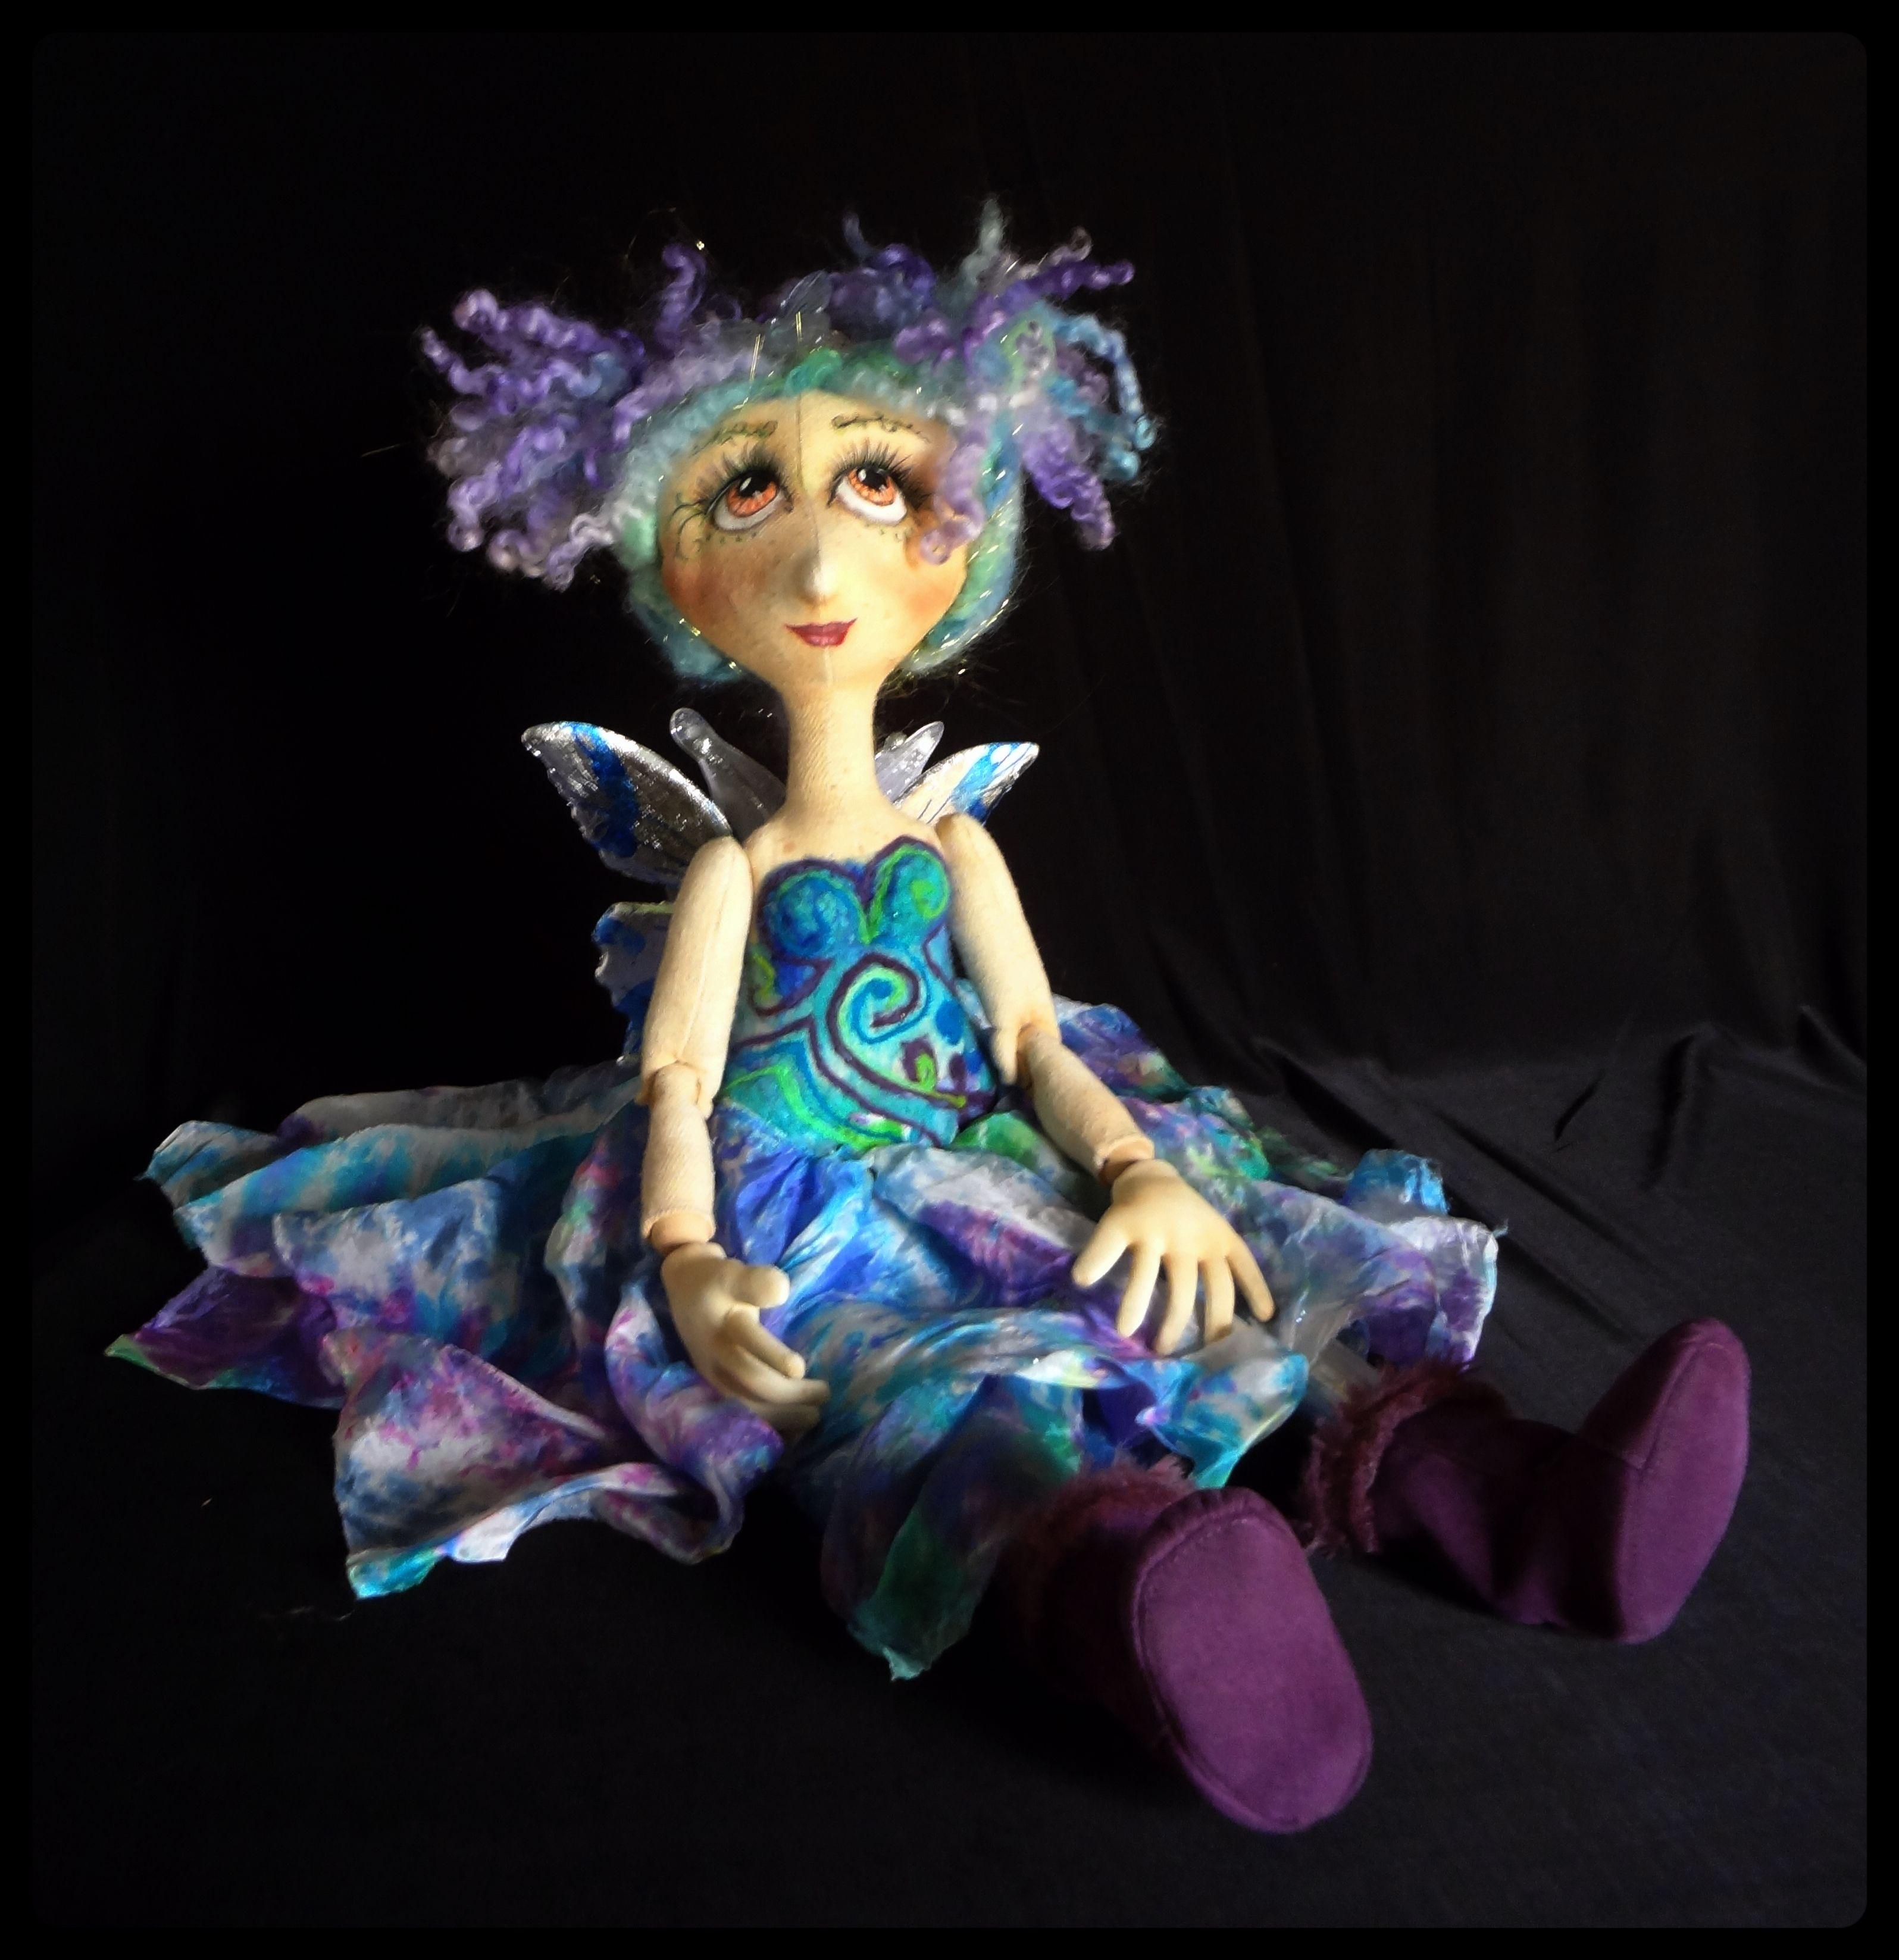 One of my newest little fairy dolls www.spilledpaint.com